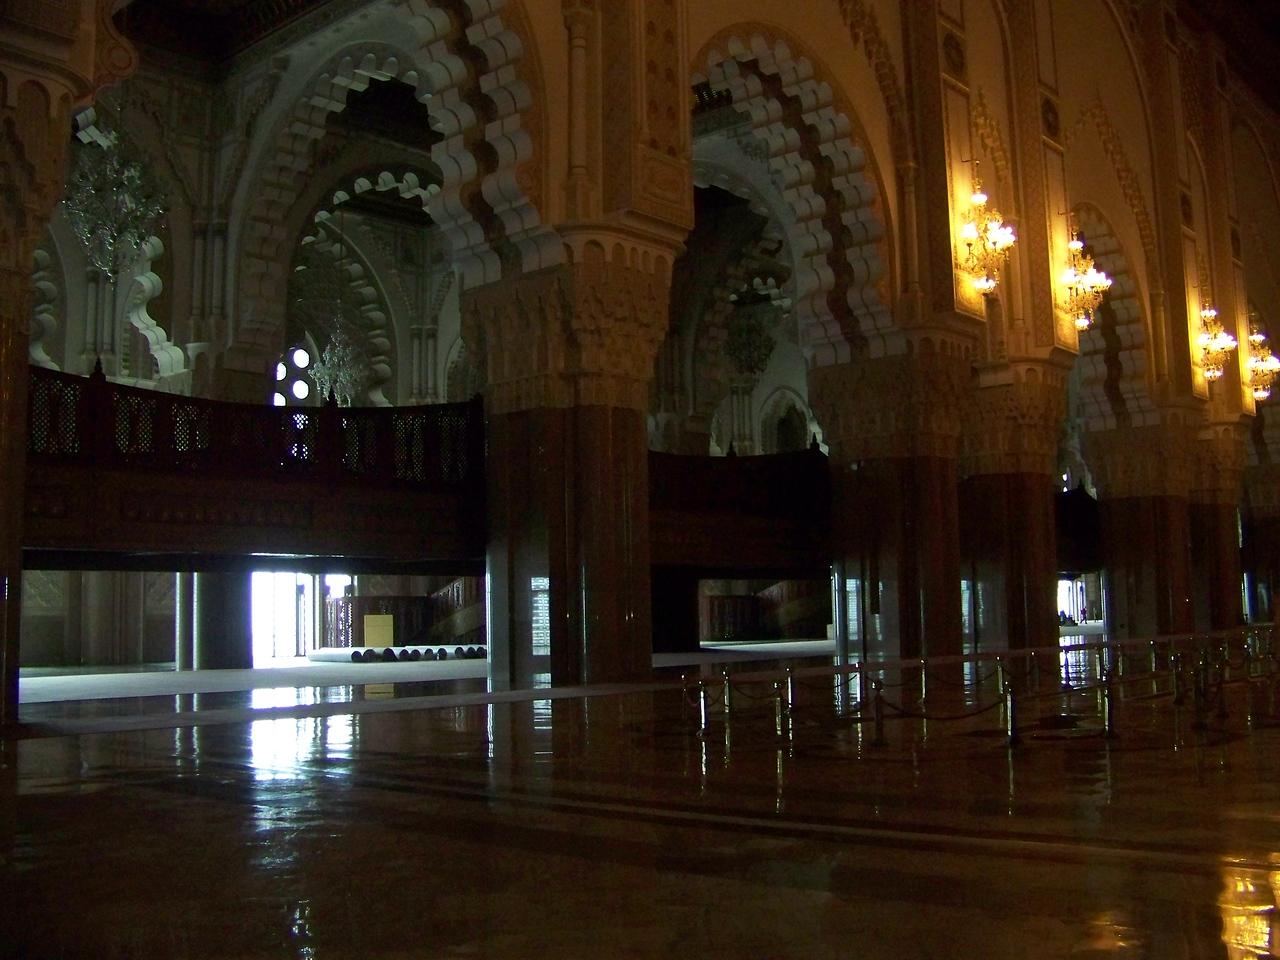 0009 - Hassan II Mosque - Casablanca Morocco.JPG